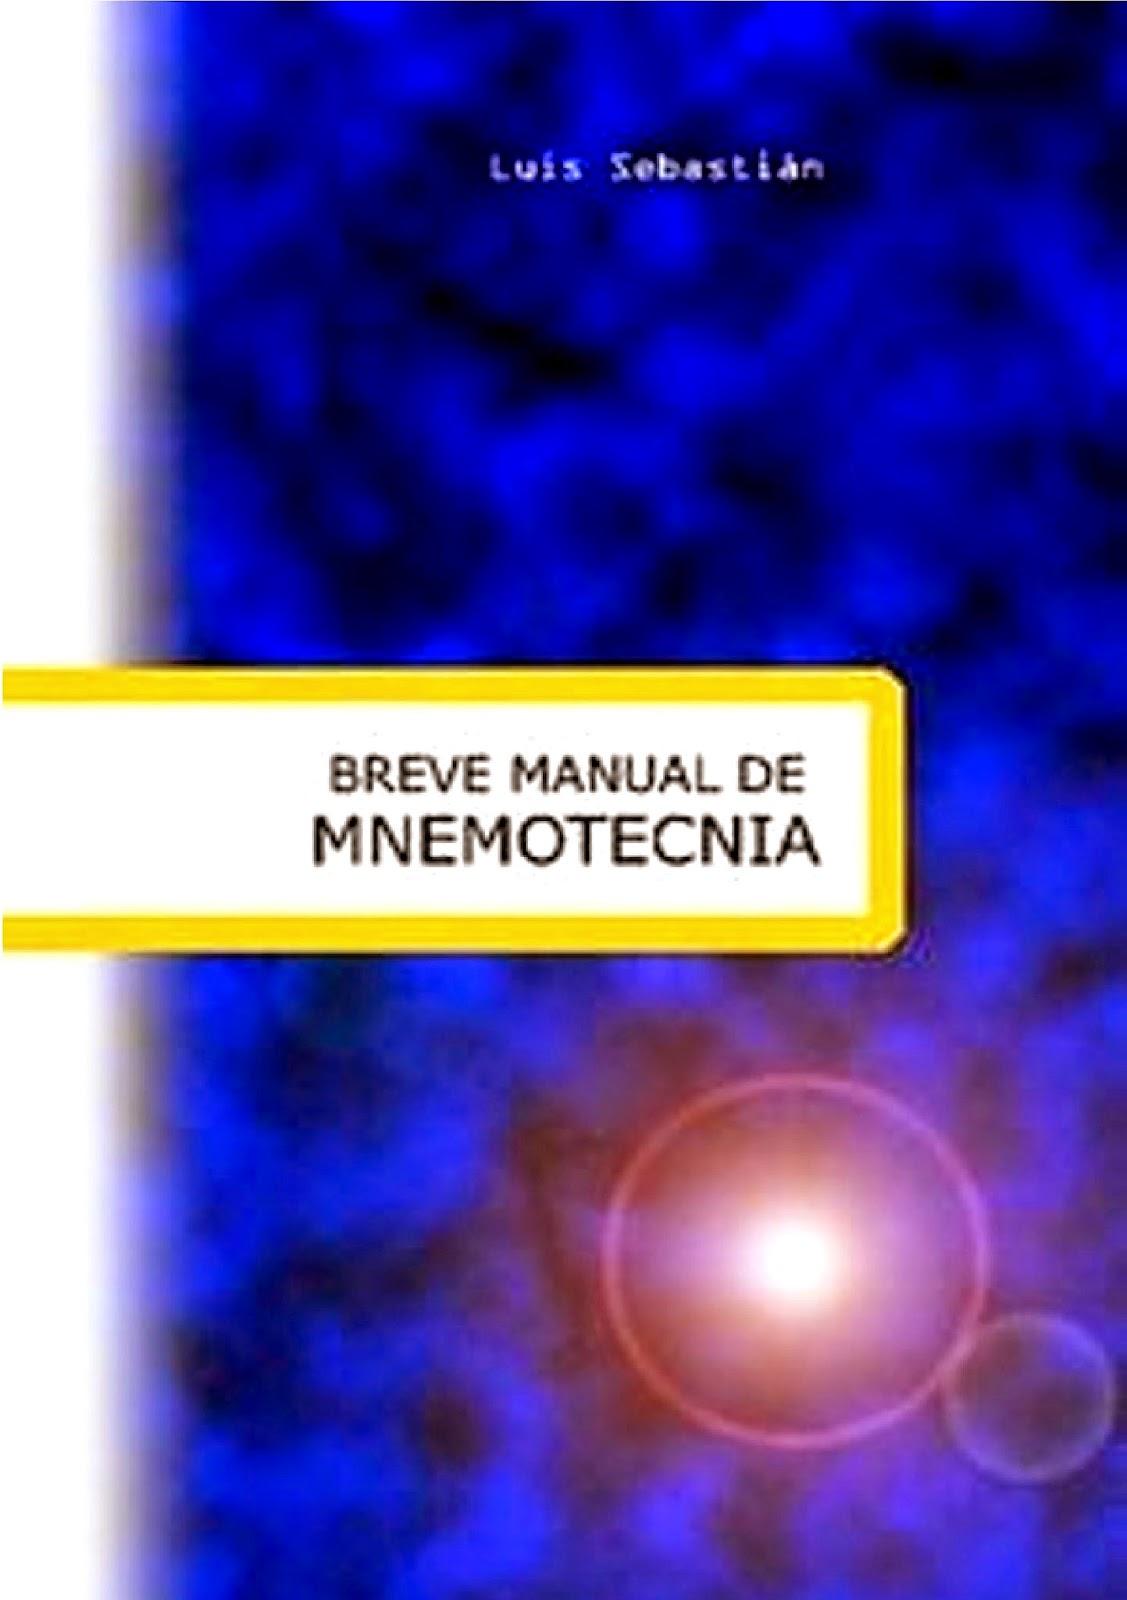 Breve Manual de Mnemotecnia – Luis Sebastián